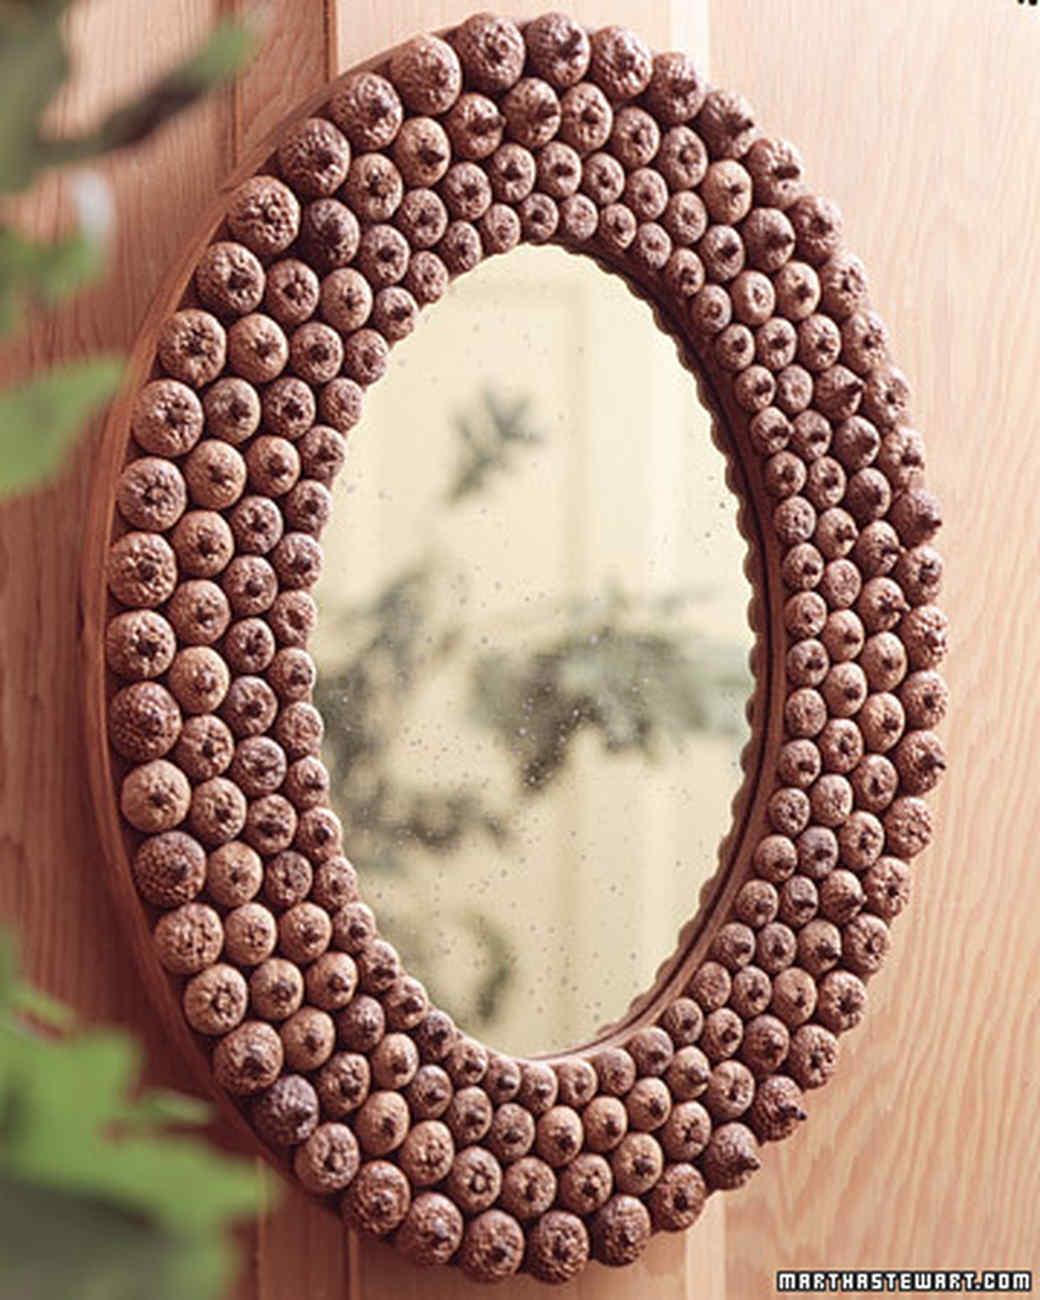 Acorn crafts martha stewart for Diy acorn crafts